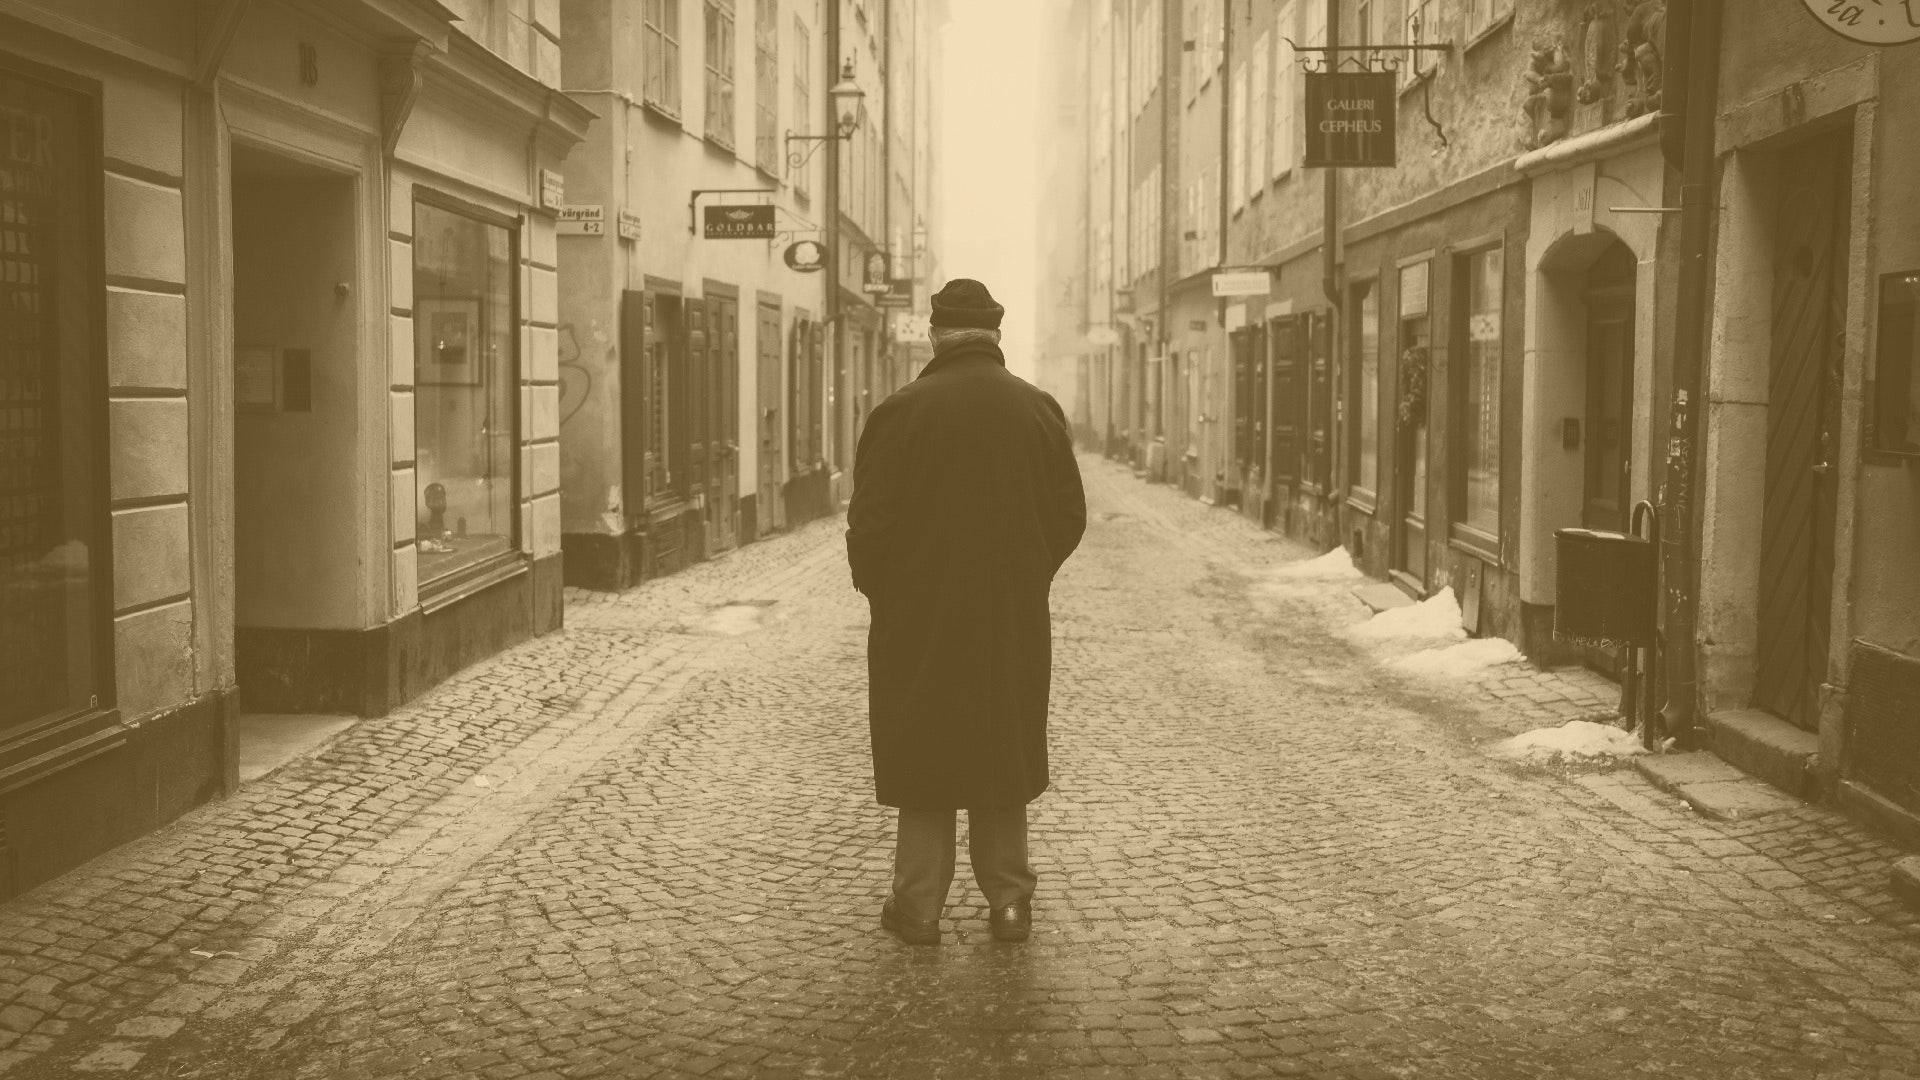 Rear view of a man walking on cobblestone photo